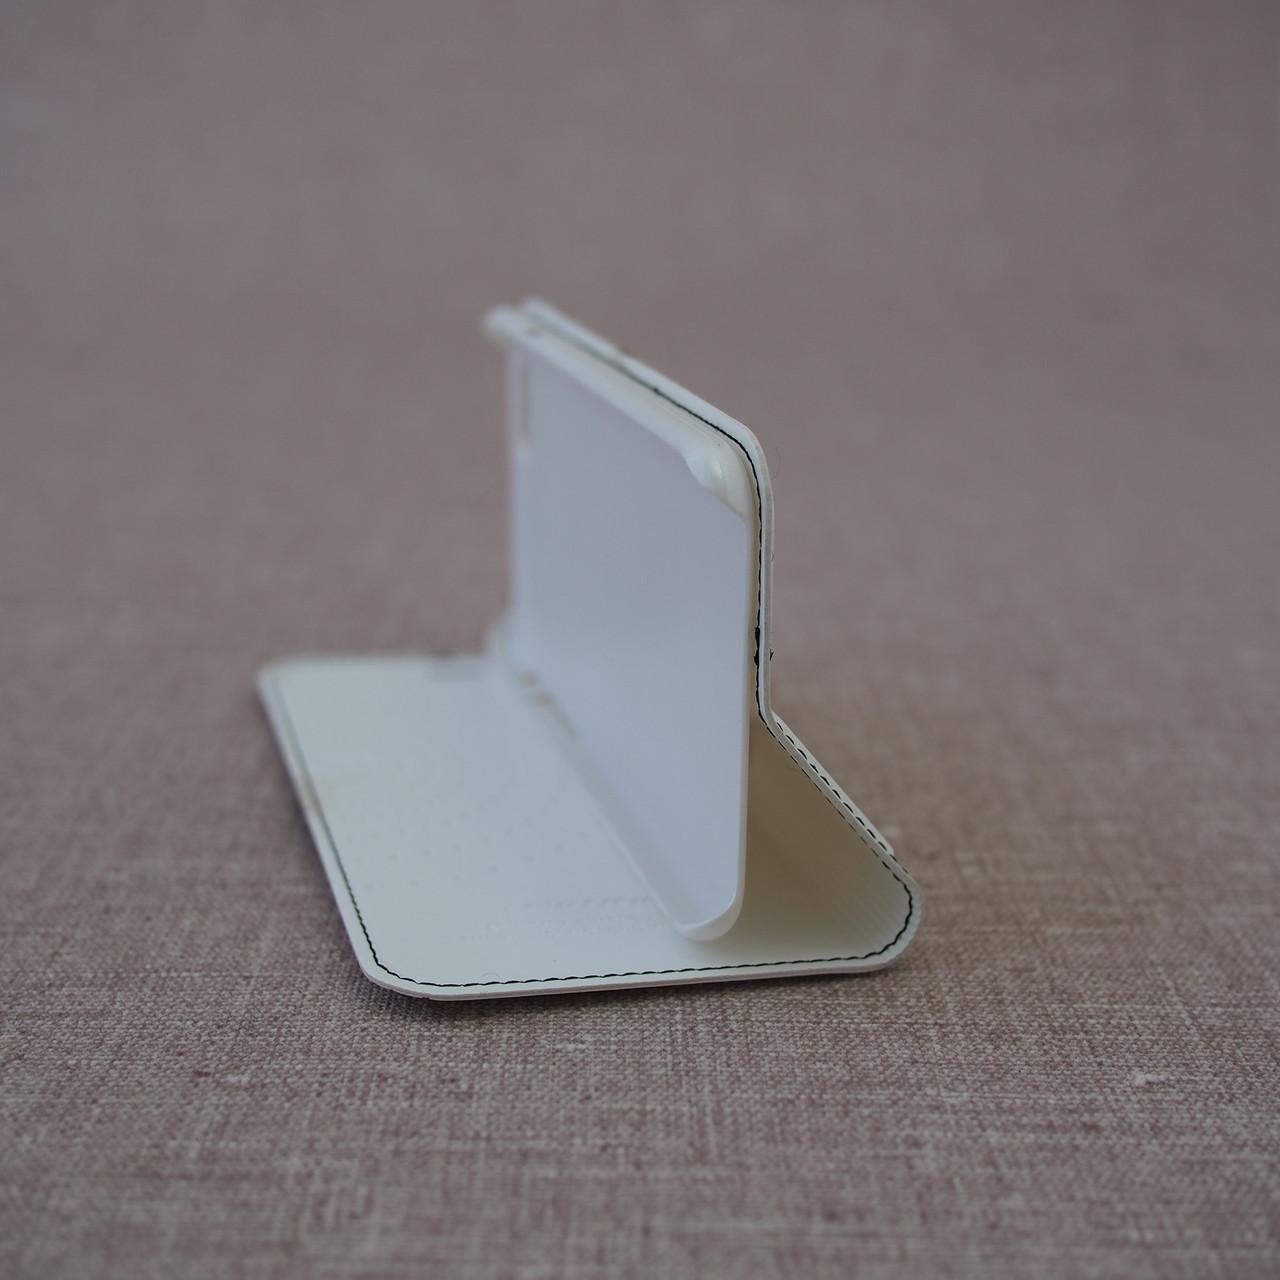 Чехол Nillkin Ice iPhone 6 white EAN/UPC: 6956473290476